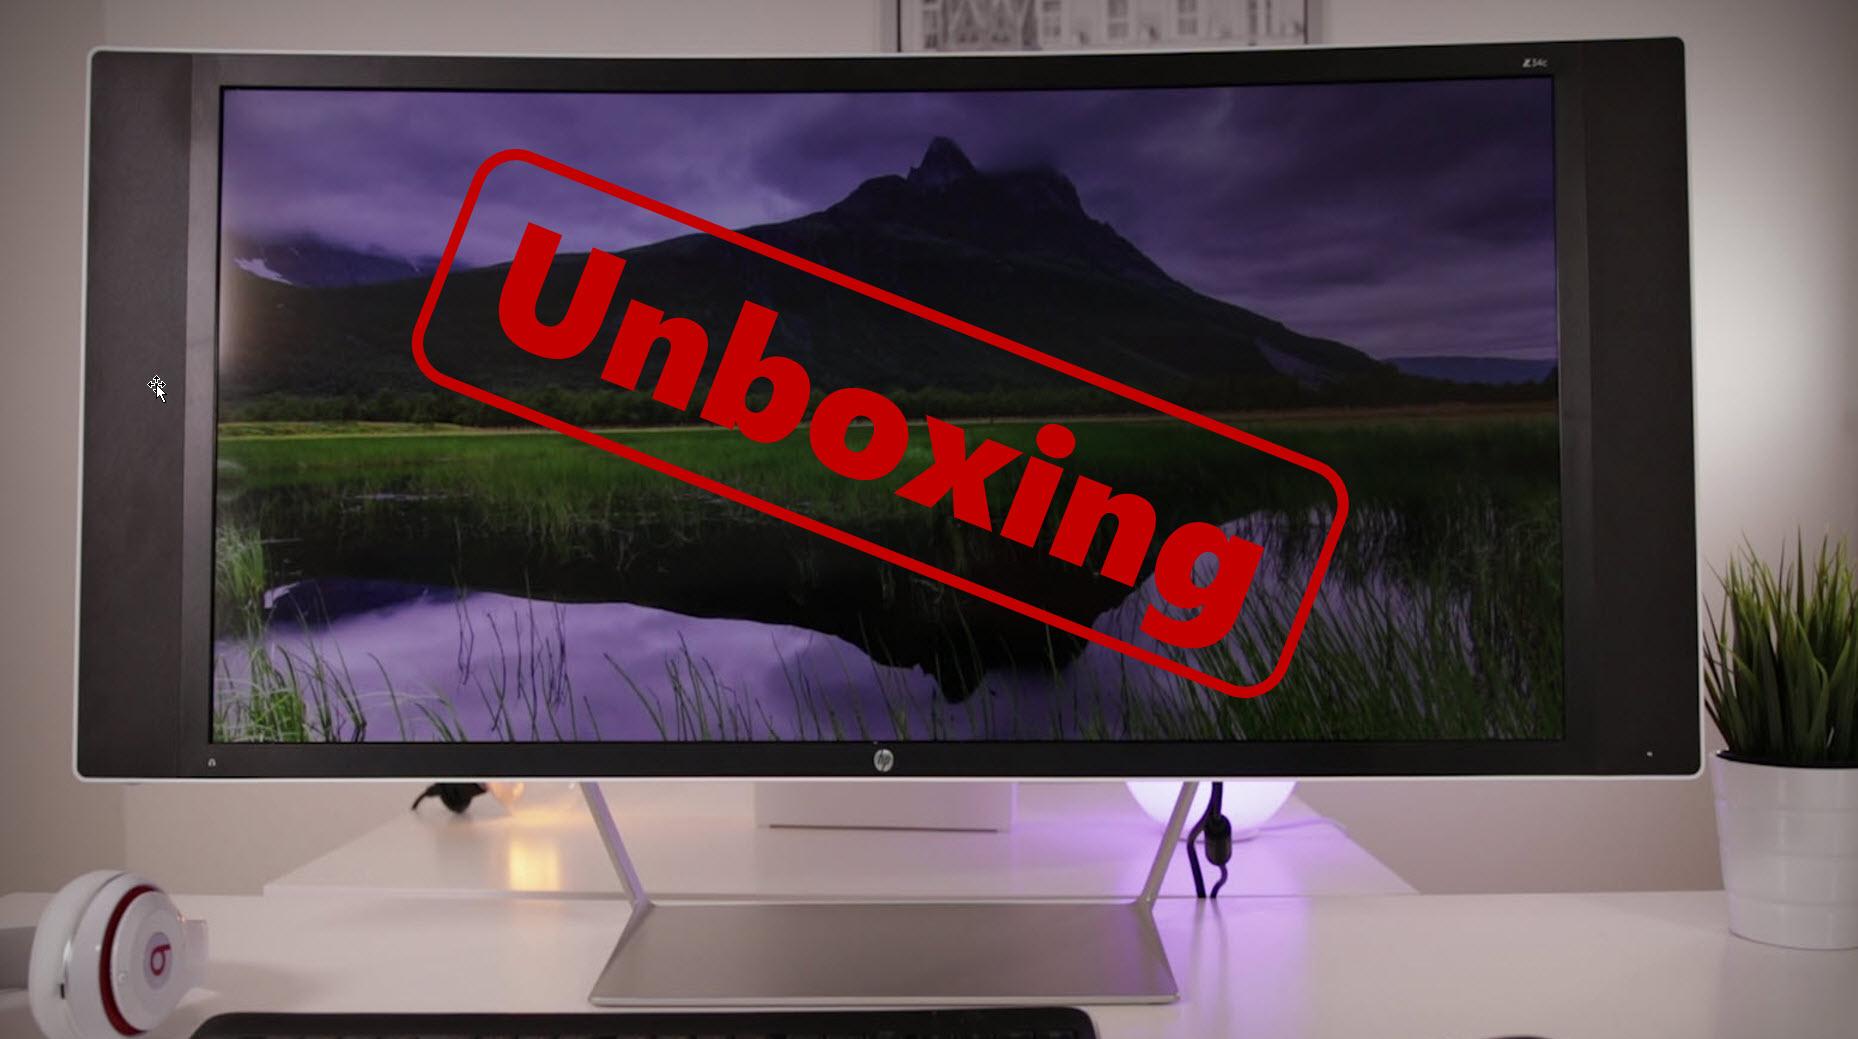 Unboxing HP Z34c 34